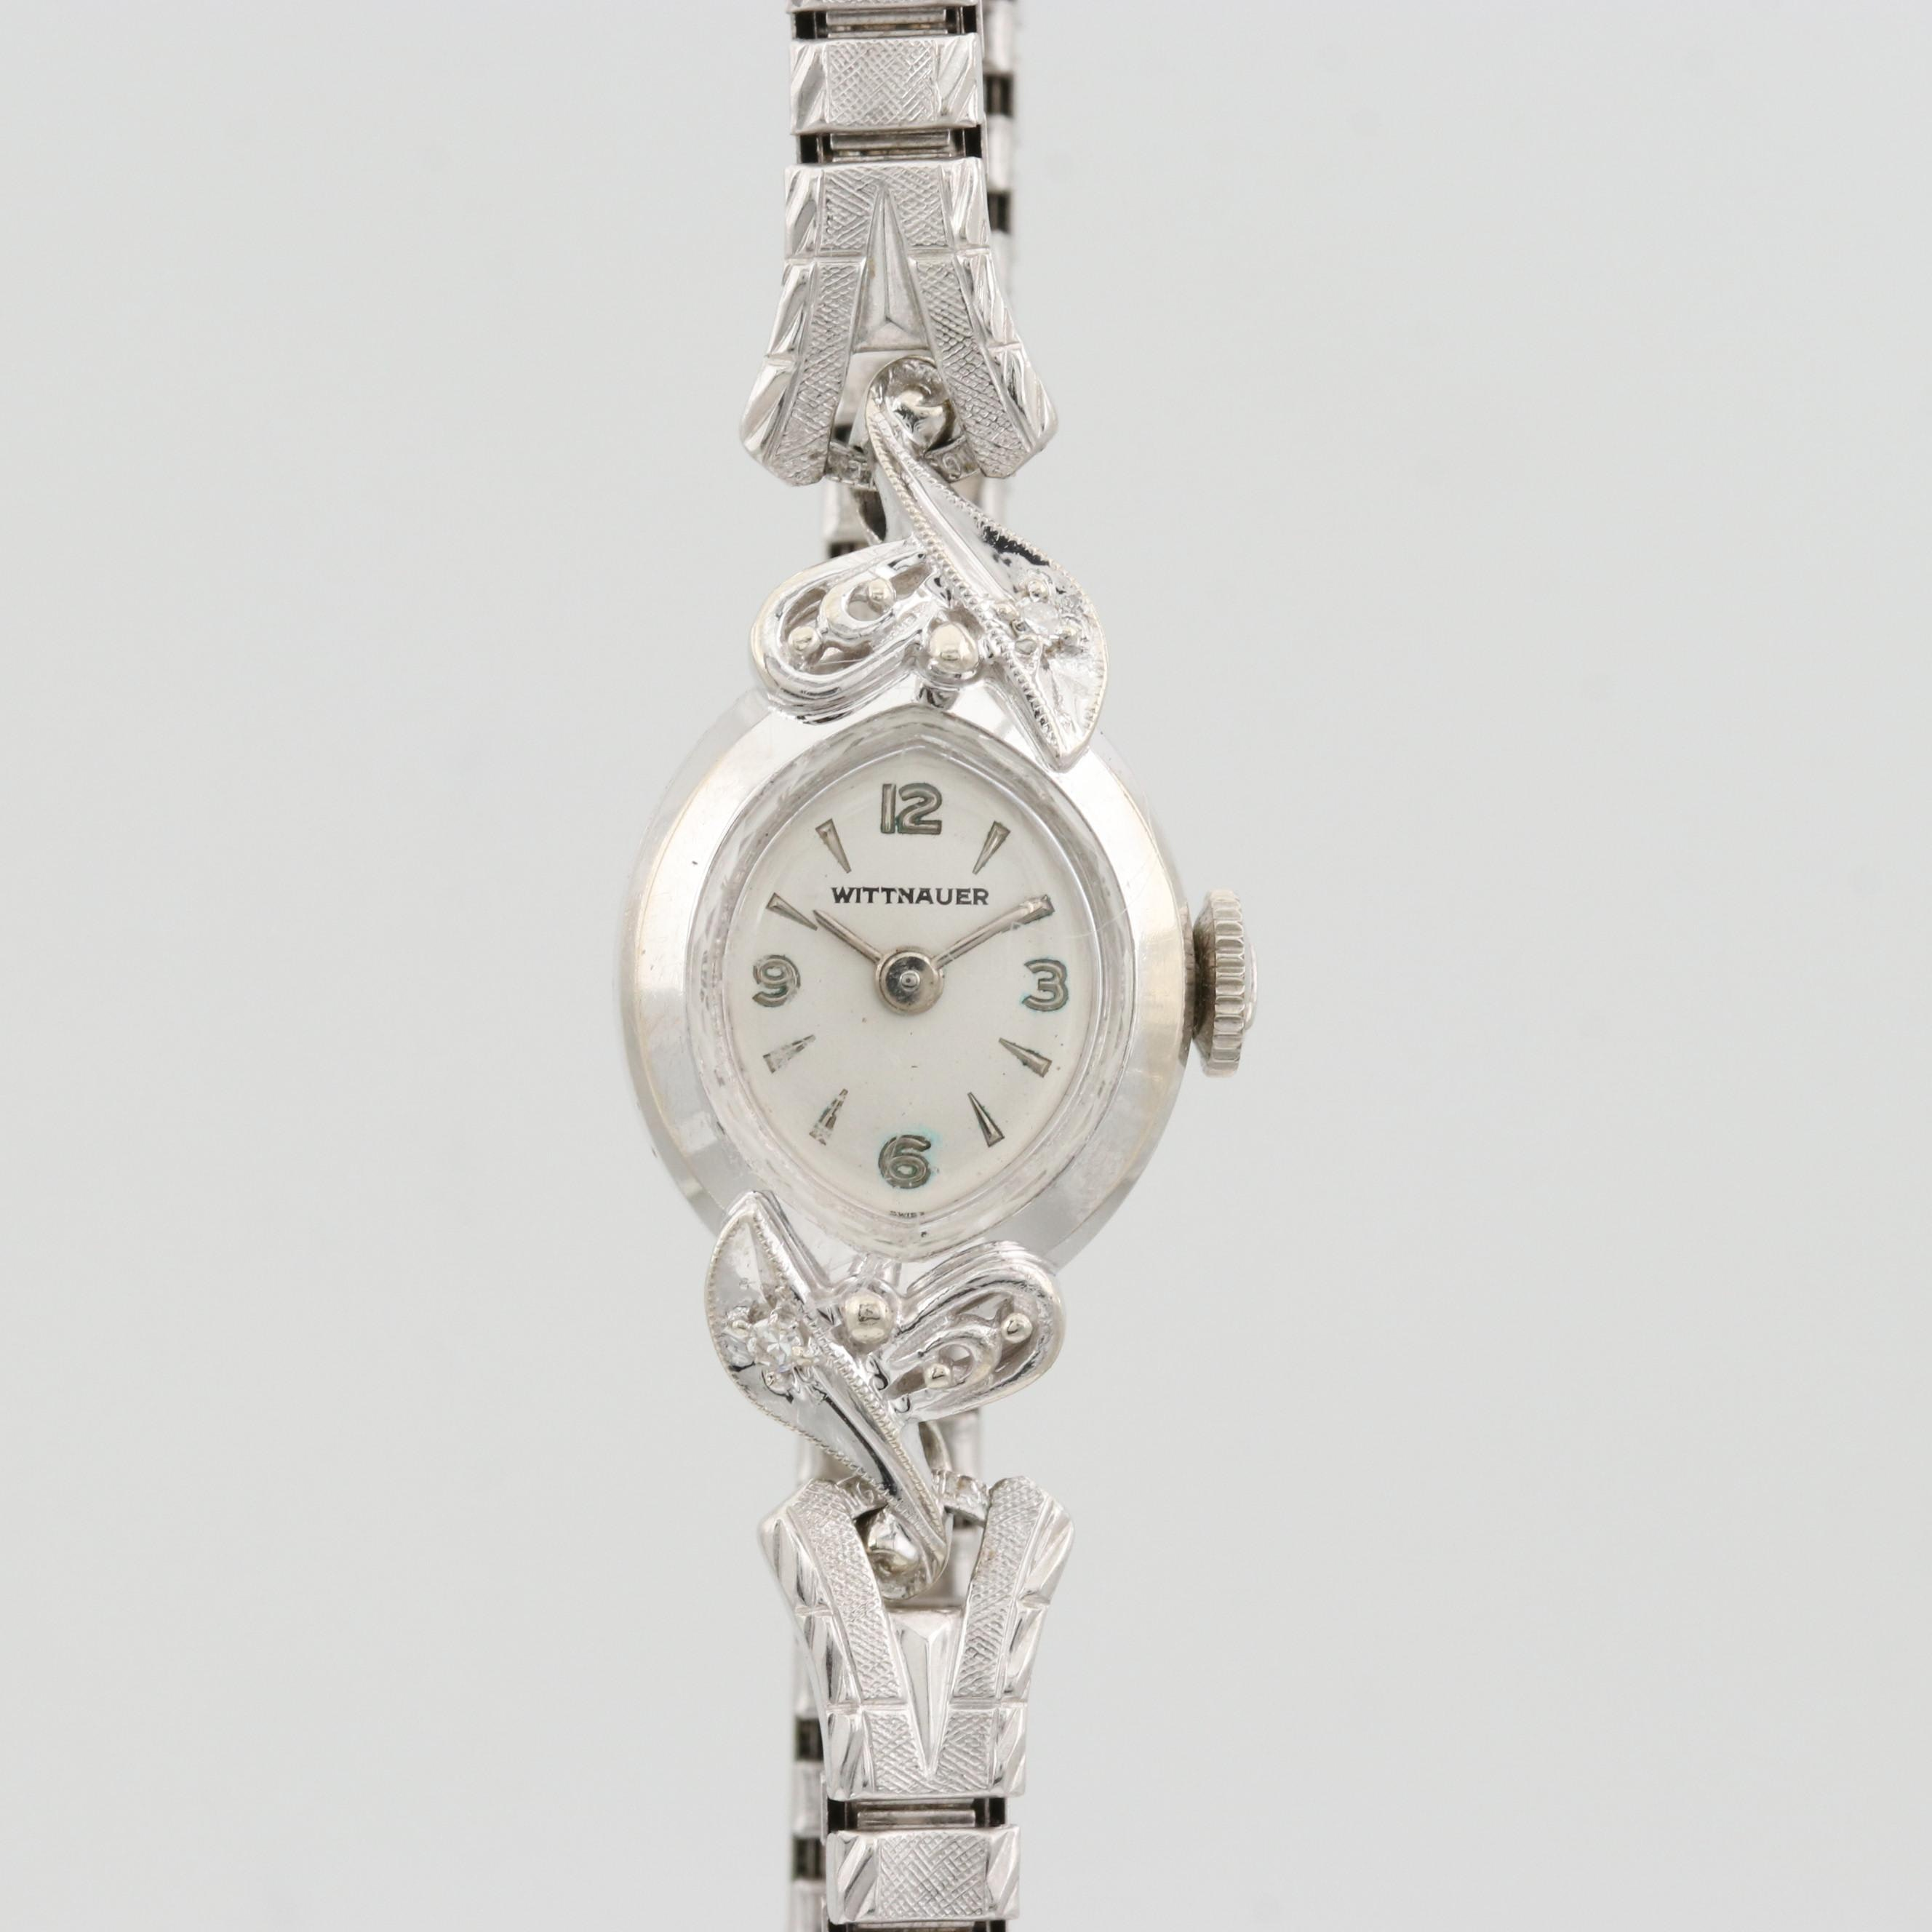 Wittnauer 14K White Gold and Diamond Lug Wristwatch